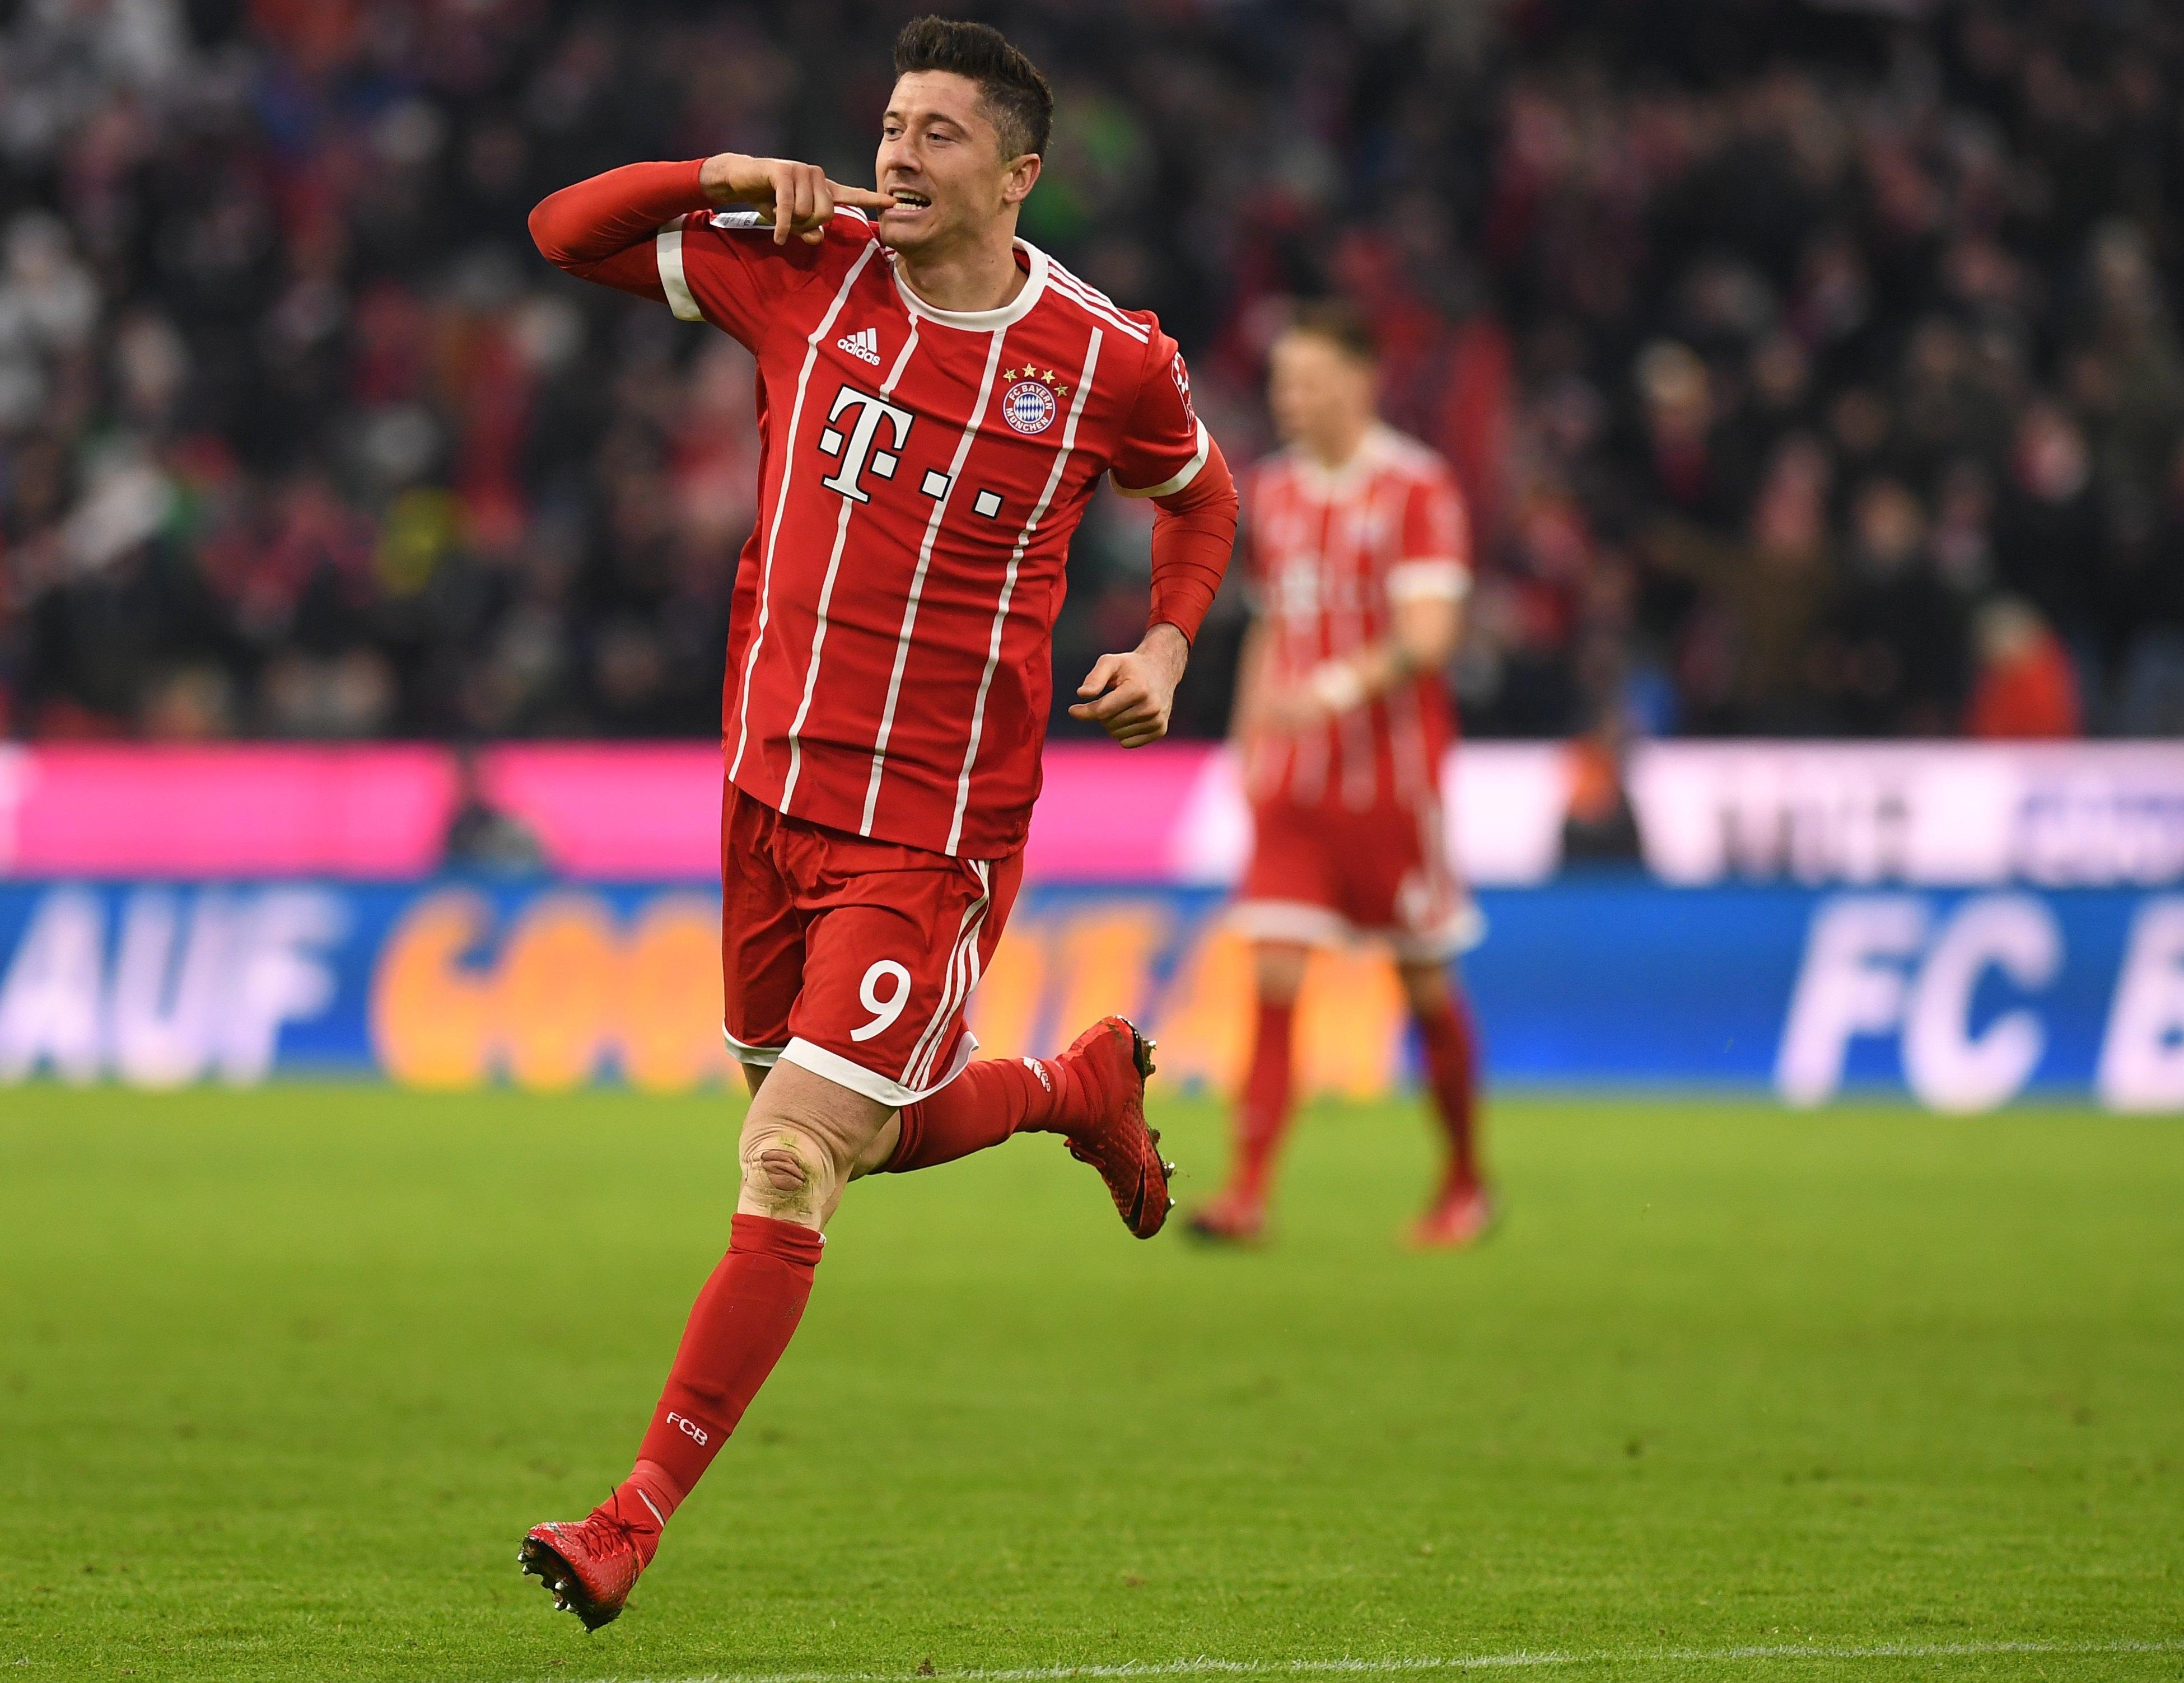 Robert Lewandowski is hoping current market will facilitate Real Madrid move